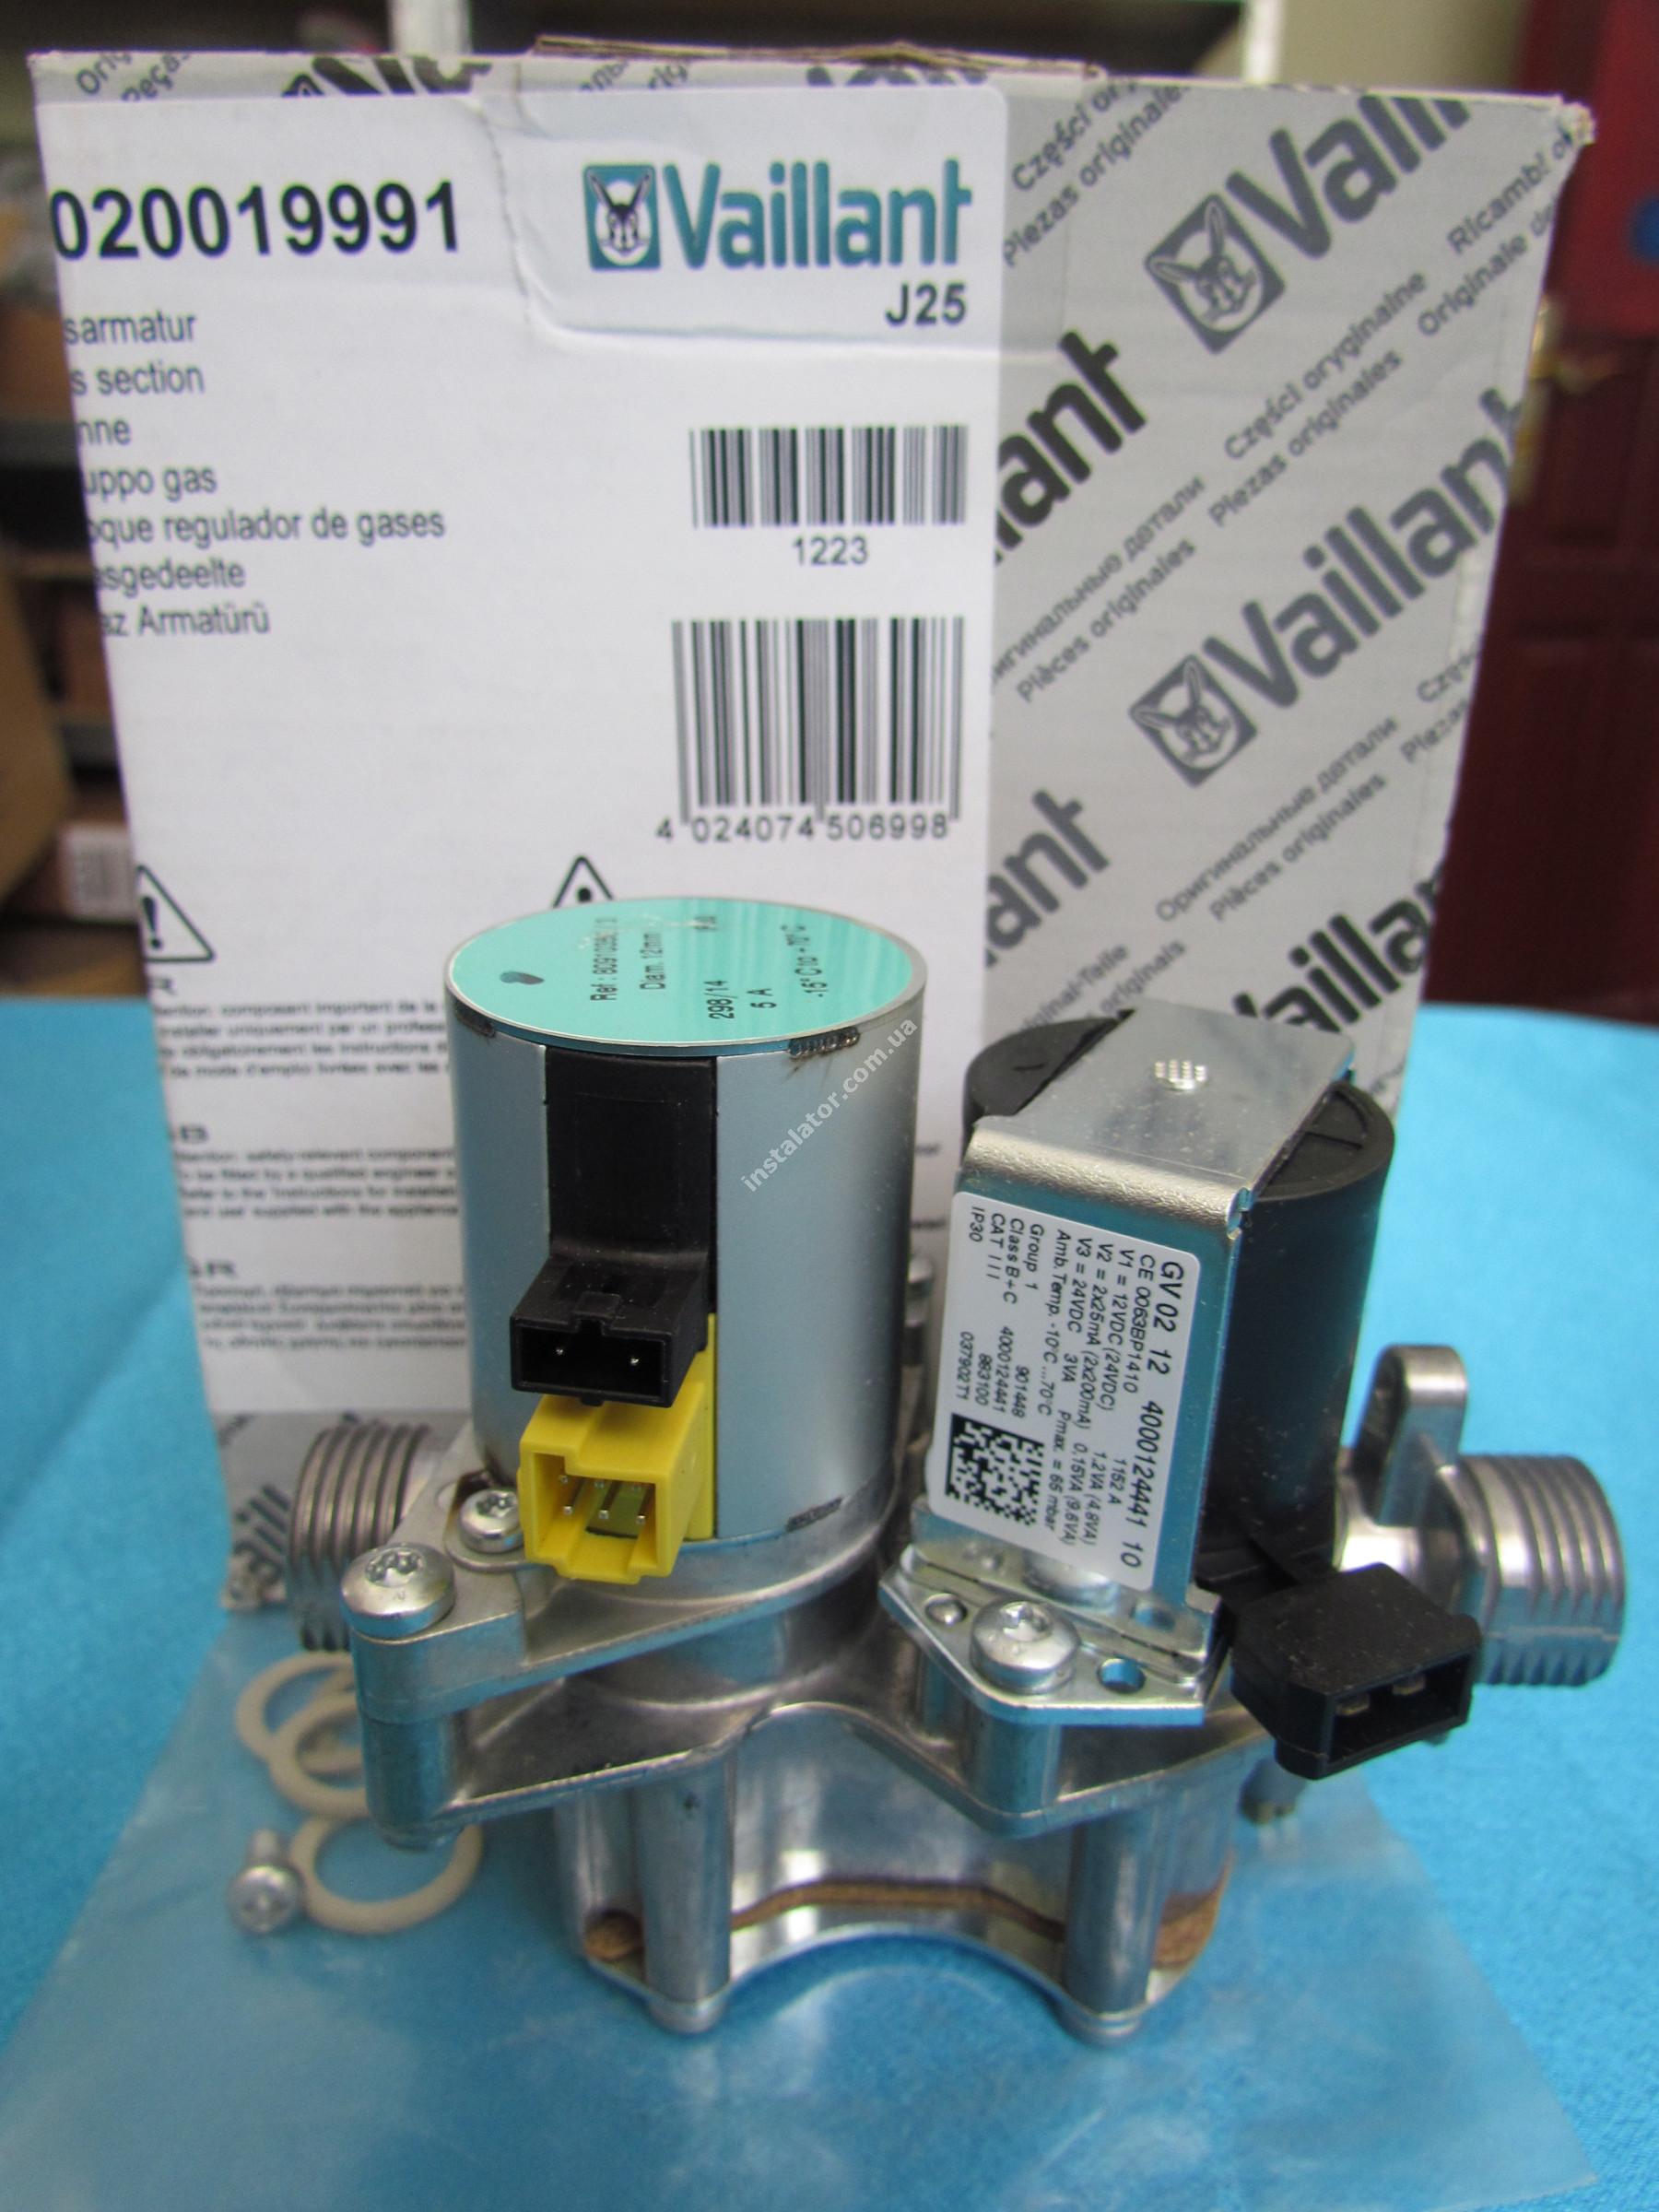 0020019991 Газовый клапан VAILLANT atmoTEC Pro / turboTEC Pro full-image-0